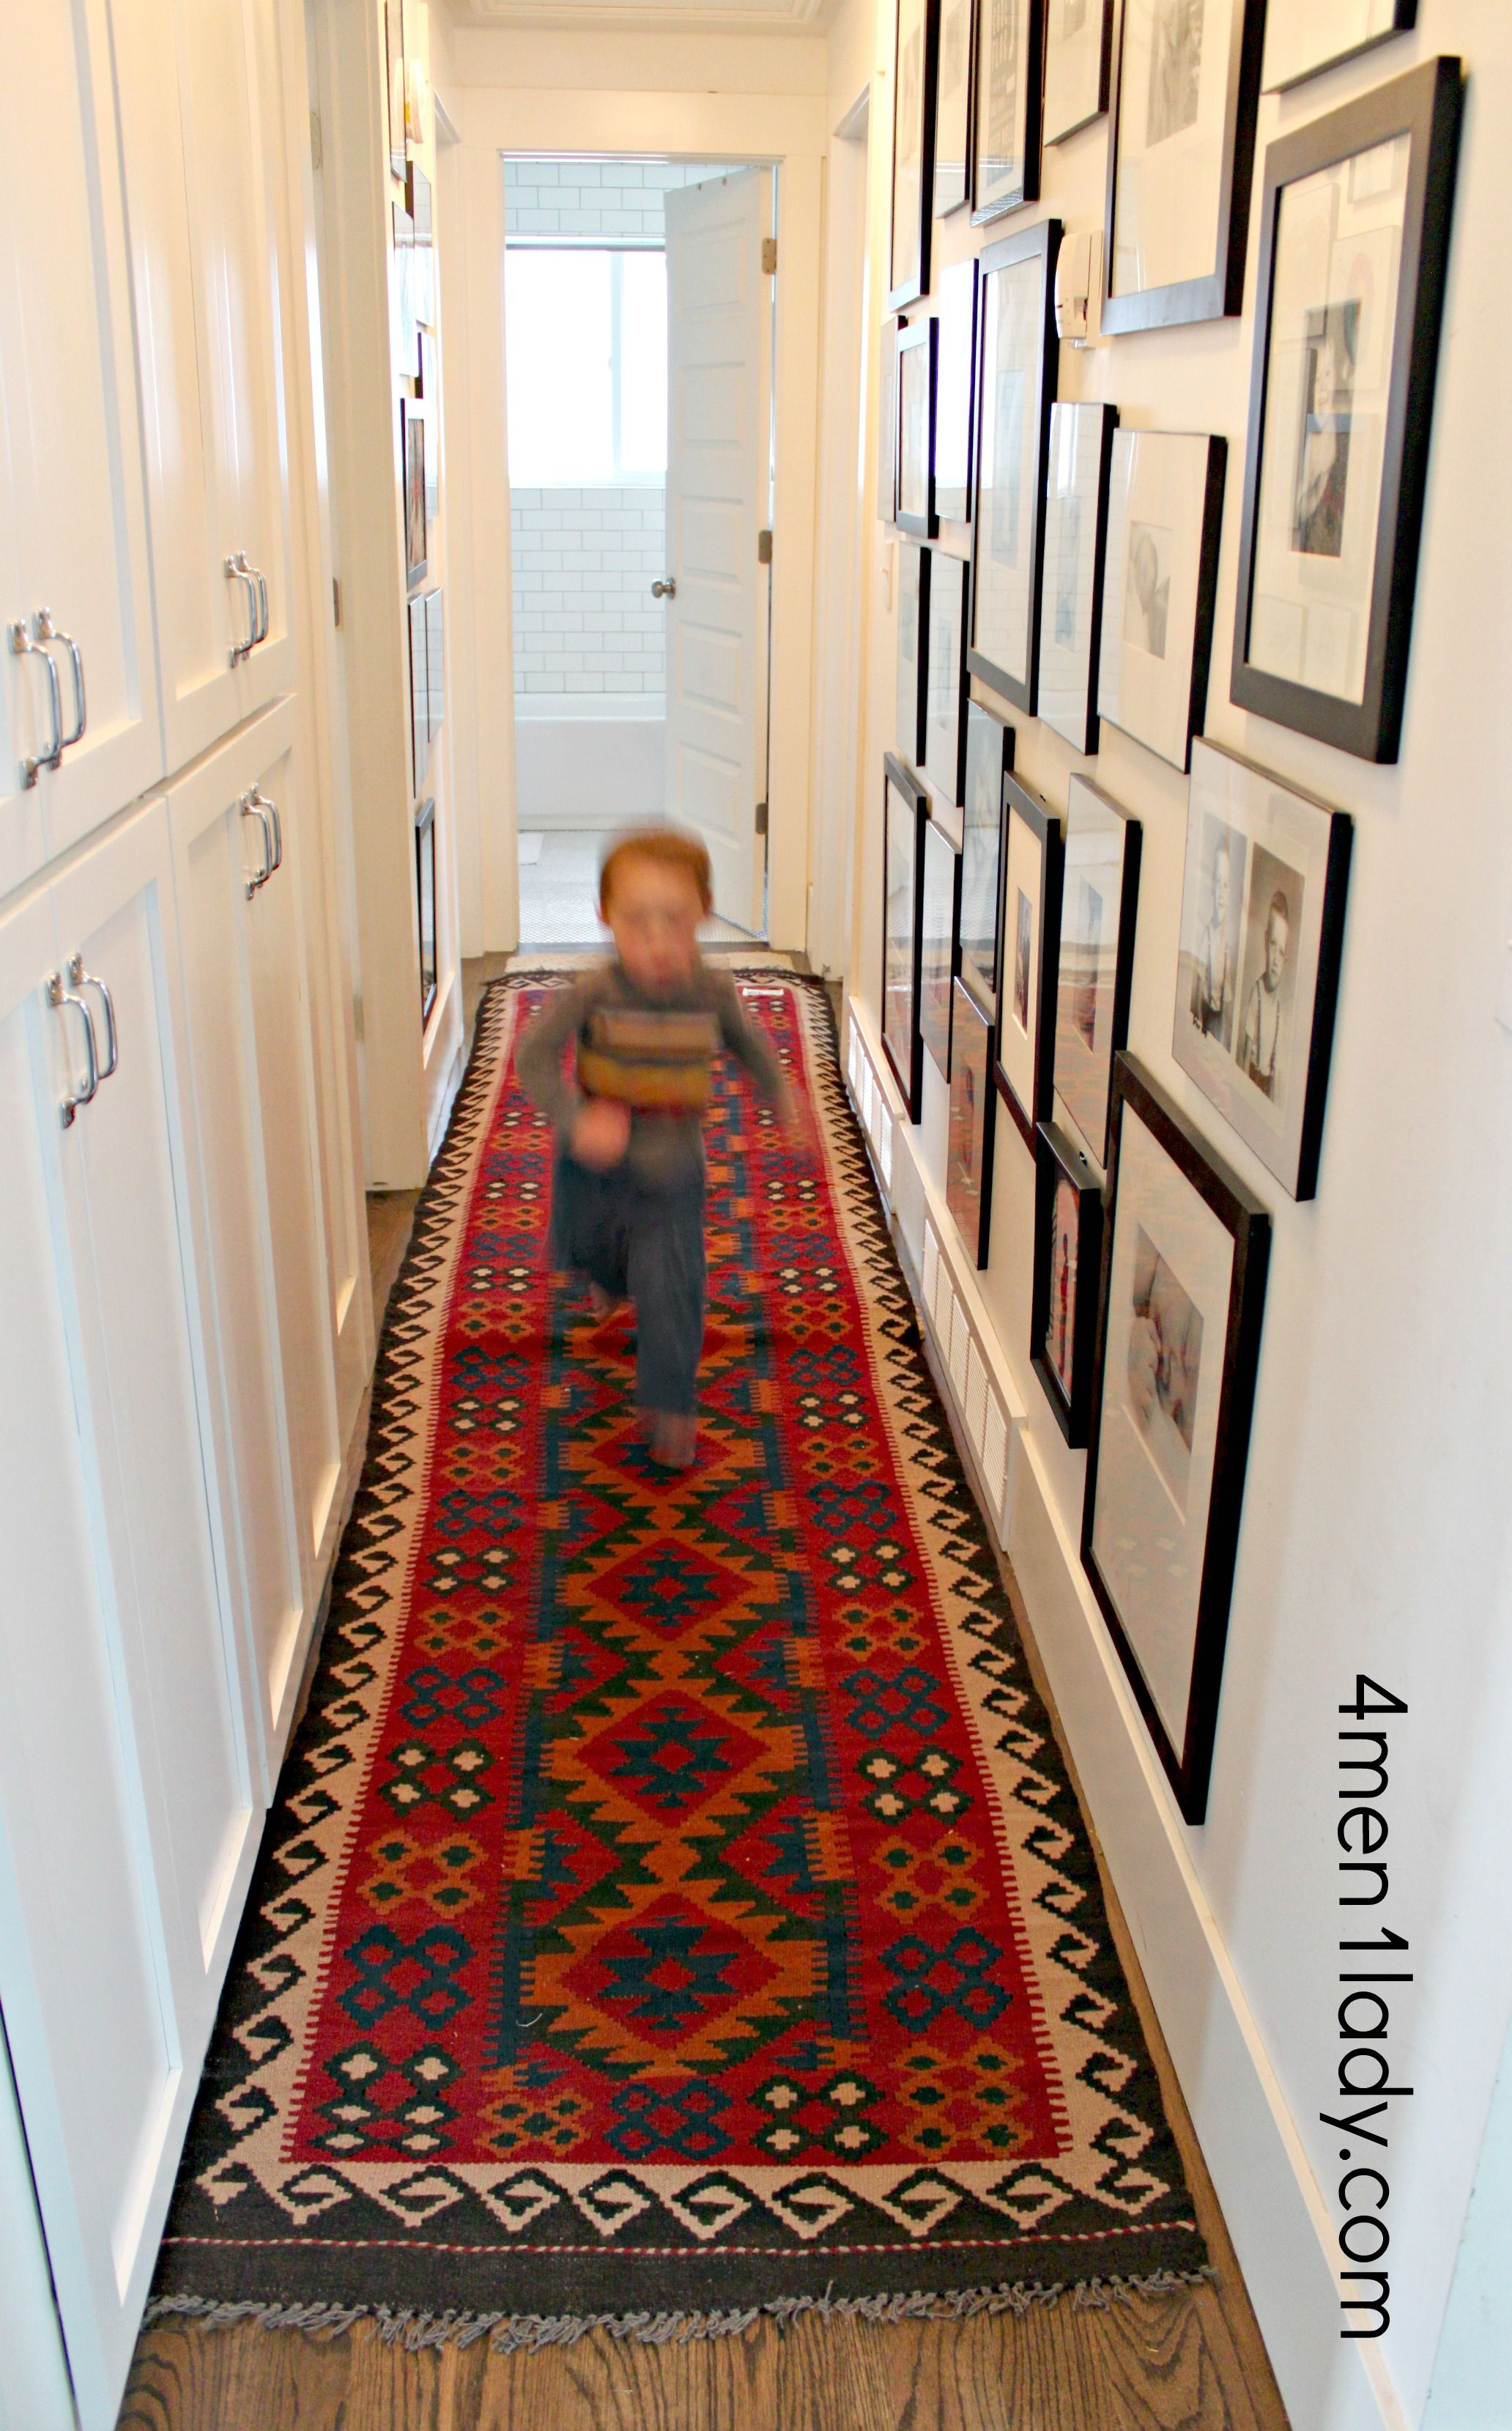 Displaying Kids Art And A Hallway Addition 4 Men 1 Lady Art Display Kids Trendy Wall Decor Hallway Decorating